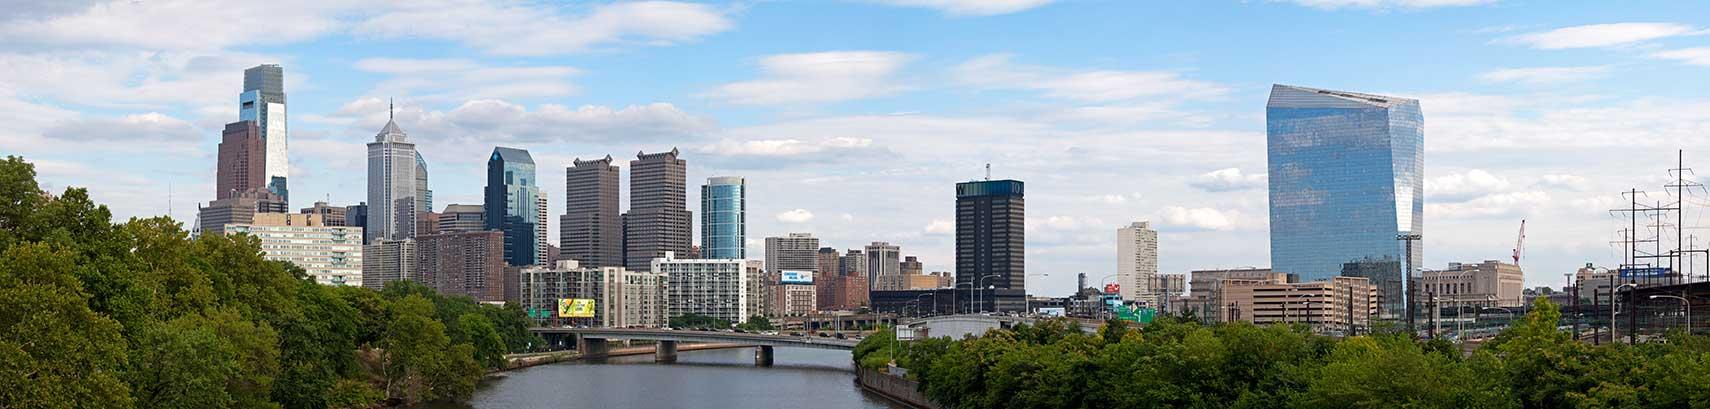 Google Map Of Philadelphia Pennsylvania USA Nations Online Project - Philadelphia usa map